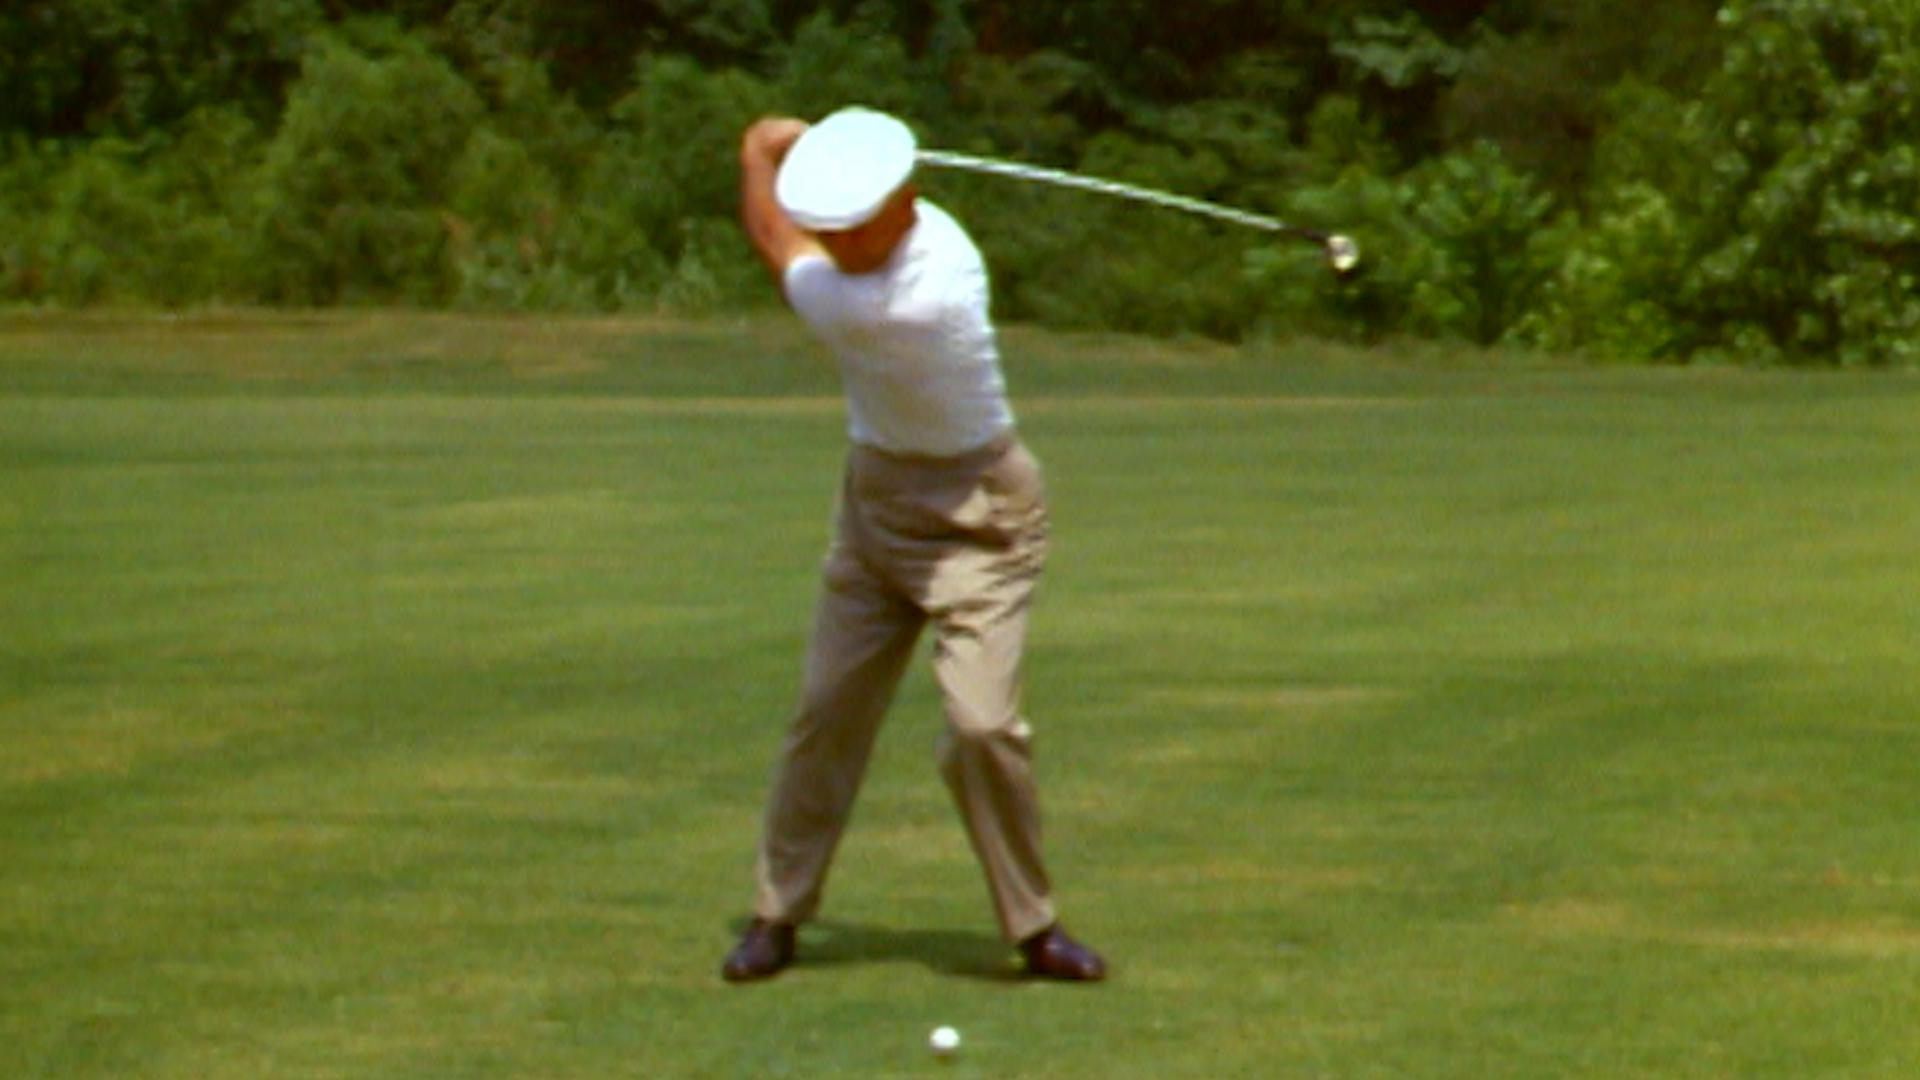 Ben Hogan's golf swing through the years